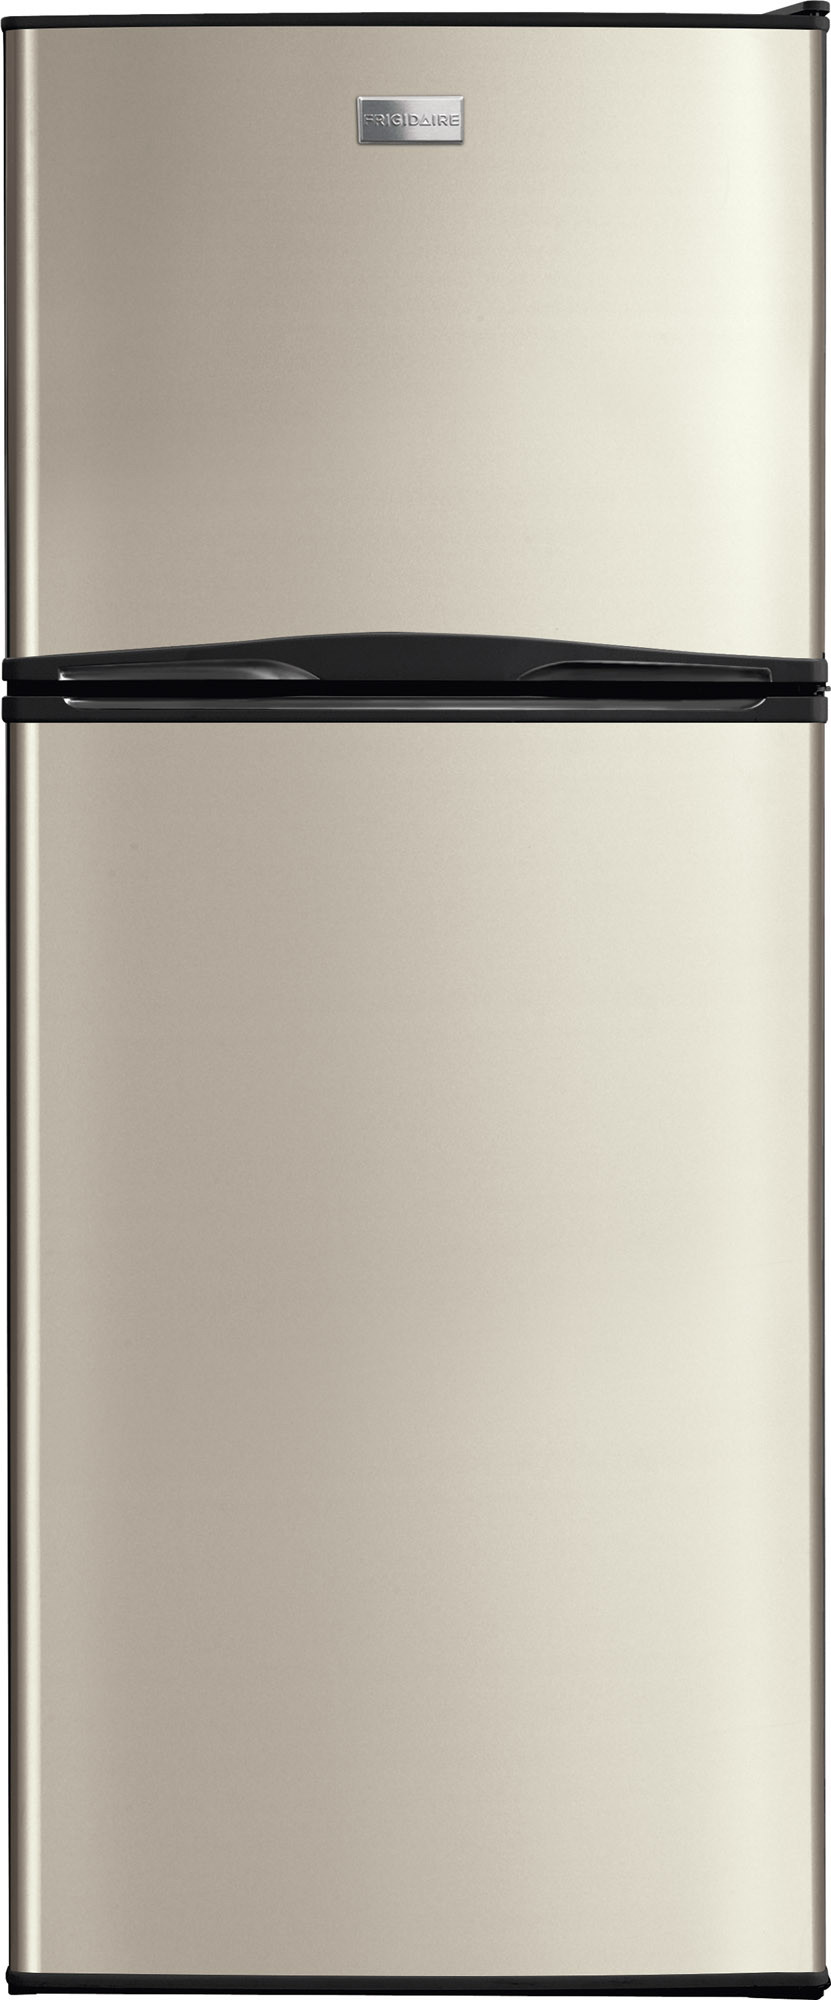 Countertop Ice Maker Menards : Frigidaire FFTR1022Q 24 Inch Top-Freezer Refrigerator with 10.0 cu. ft ...